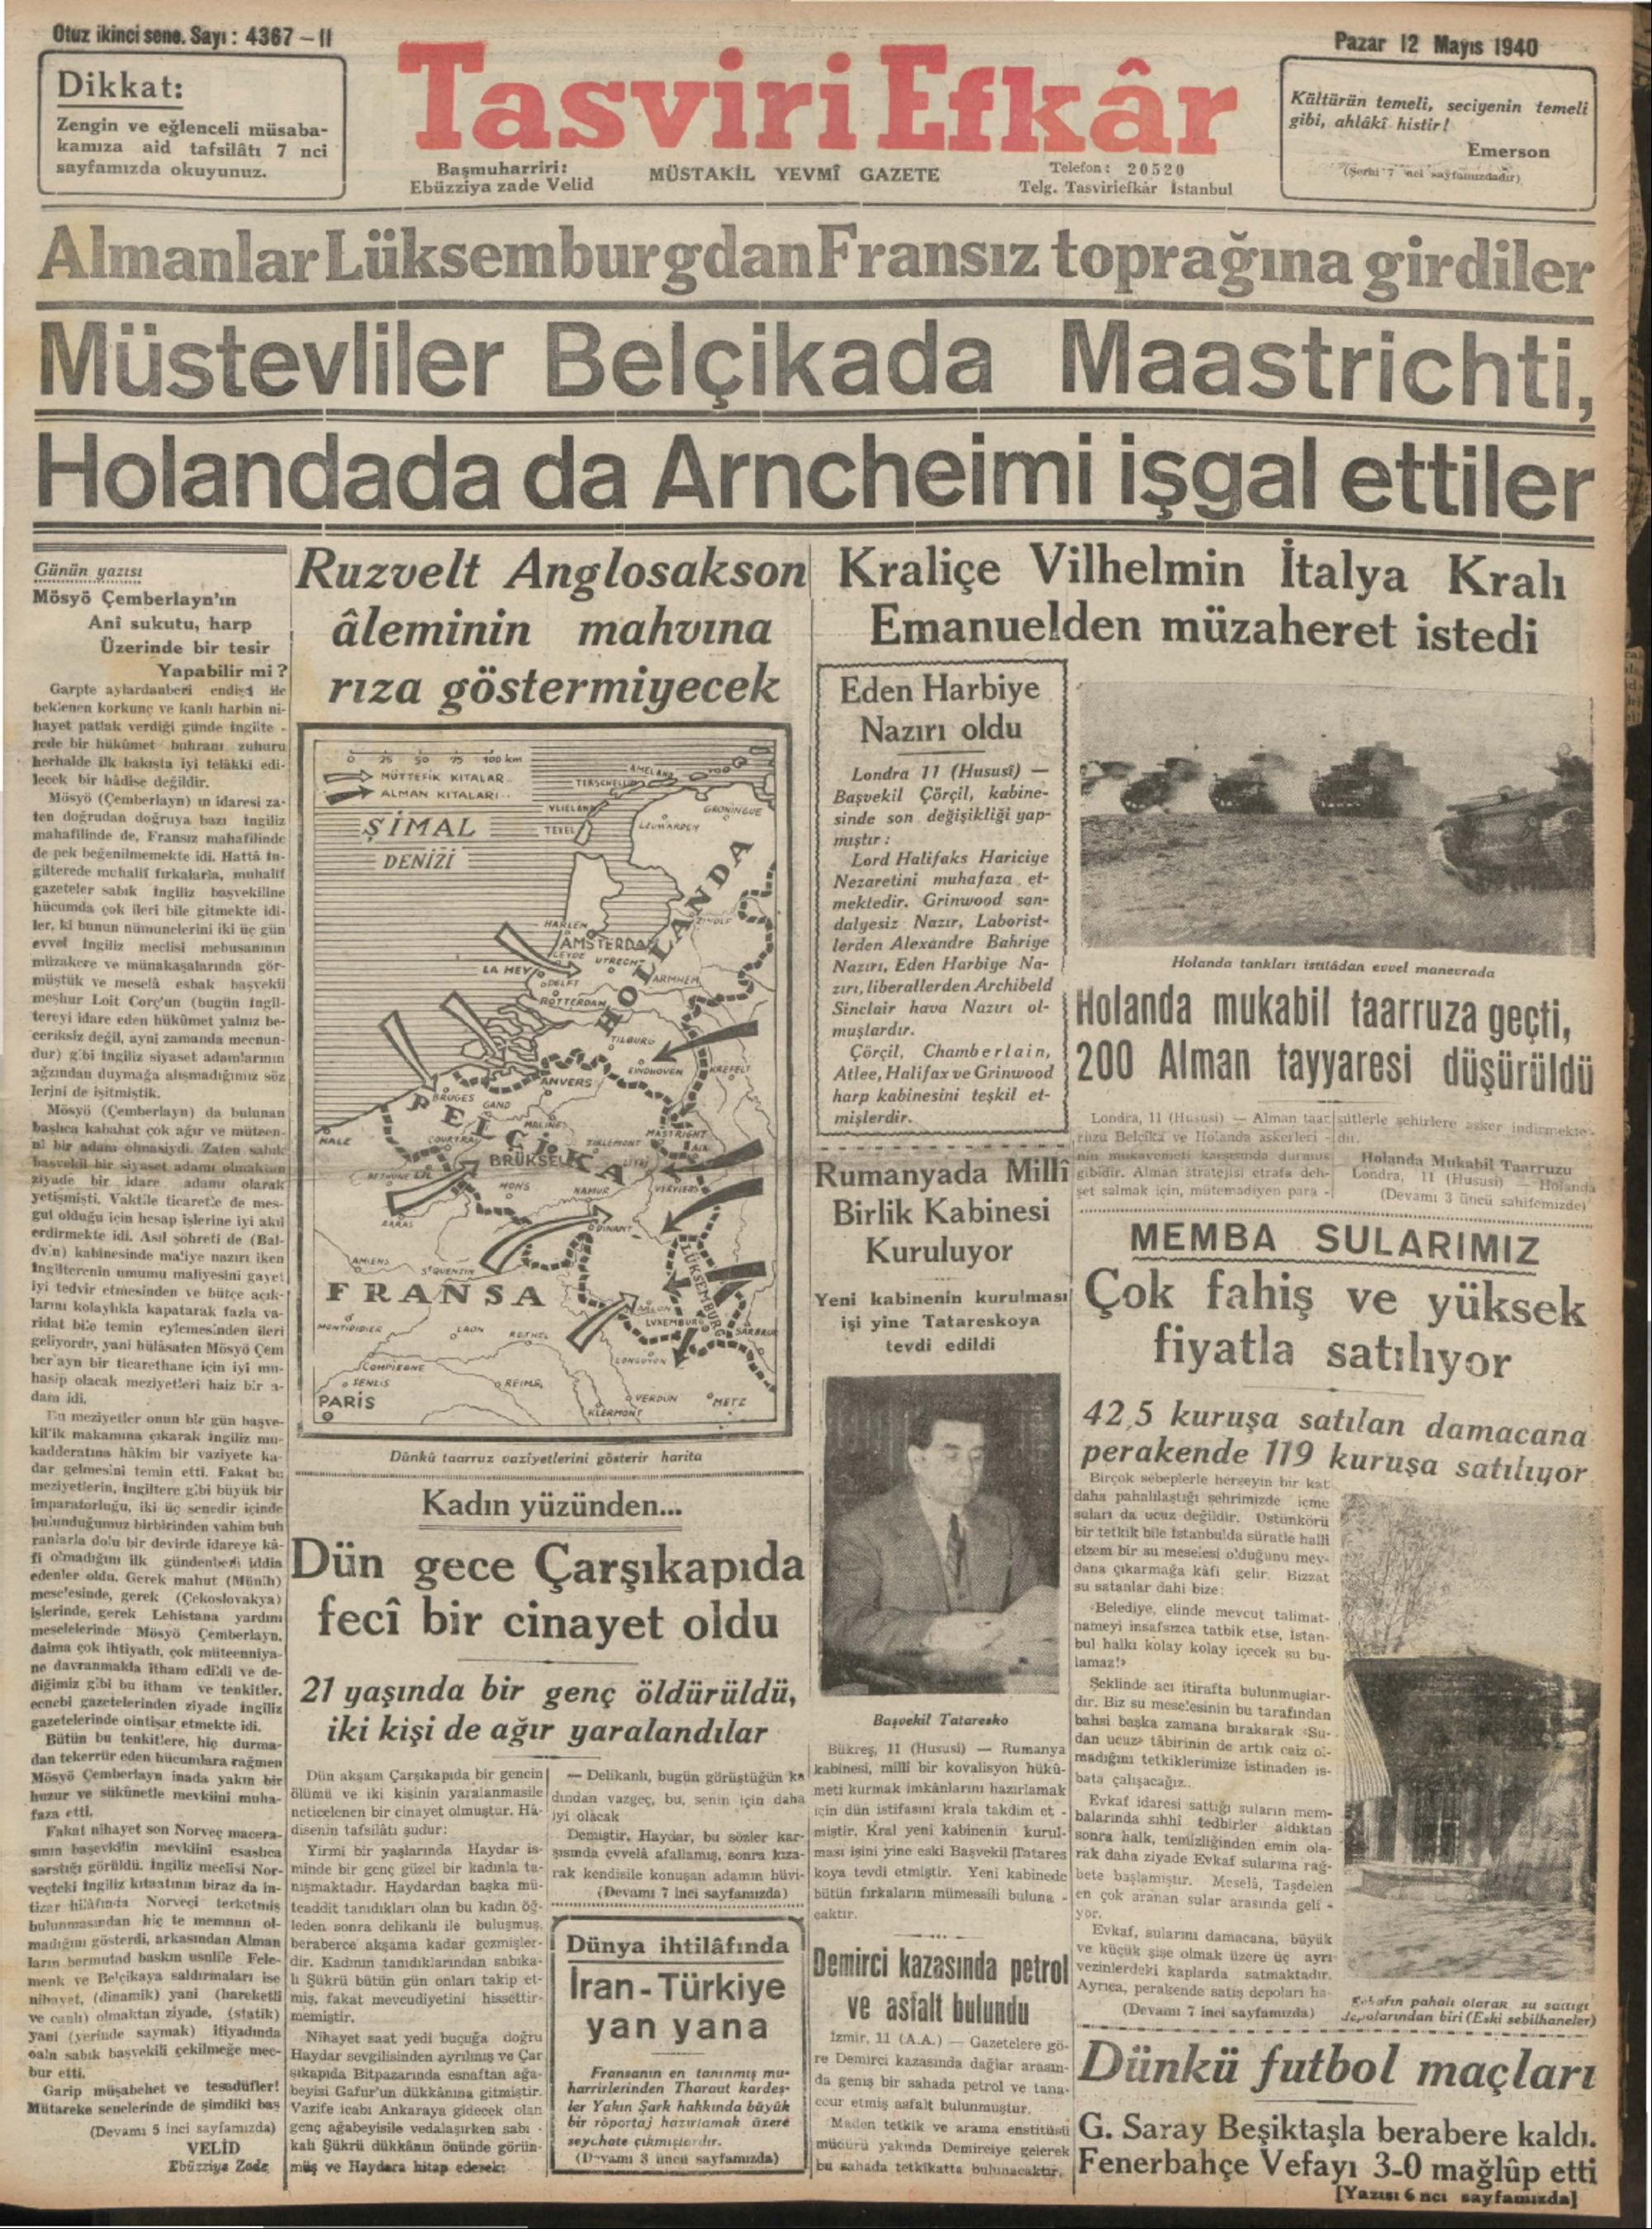 12 Mayıs 1940 Tarihli Tasviri Efkar Gazetesi Sayfa 1